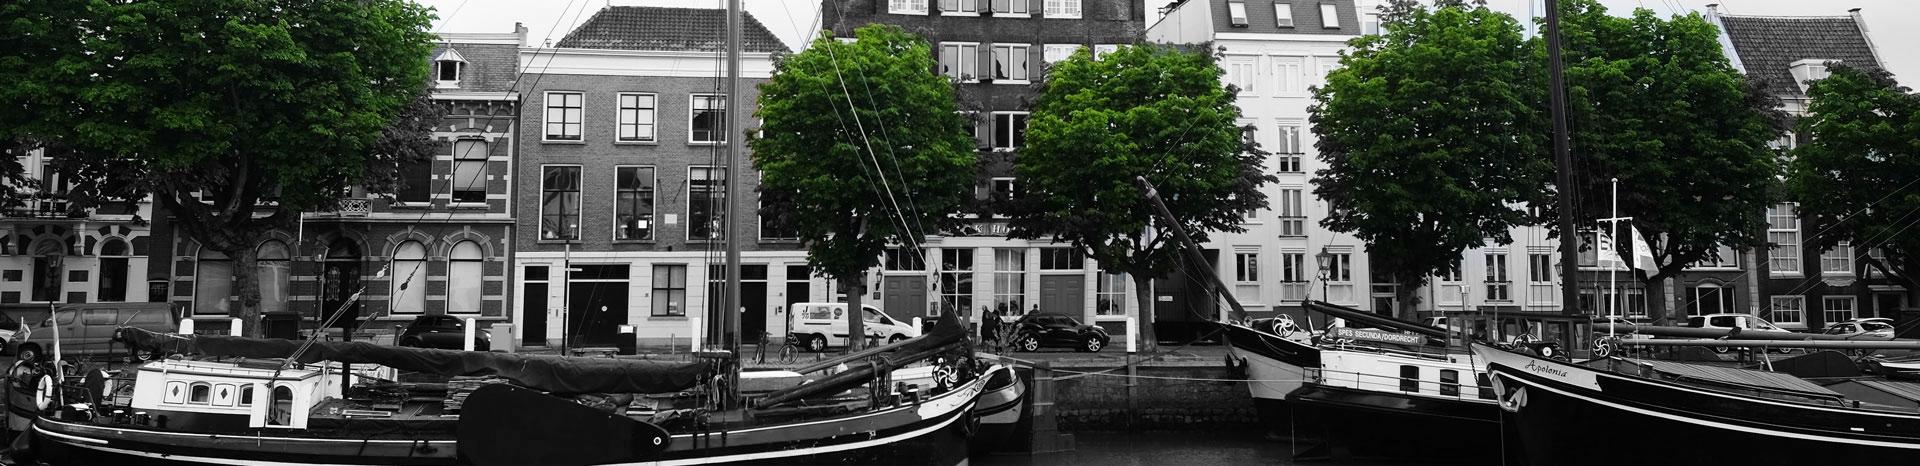 Letselschade advocaat Dordrecht | LetselPro